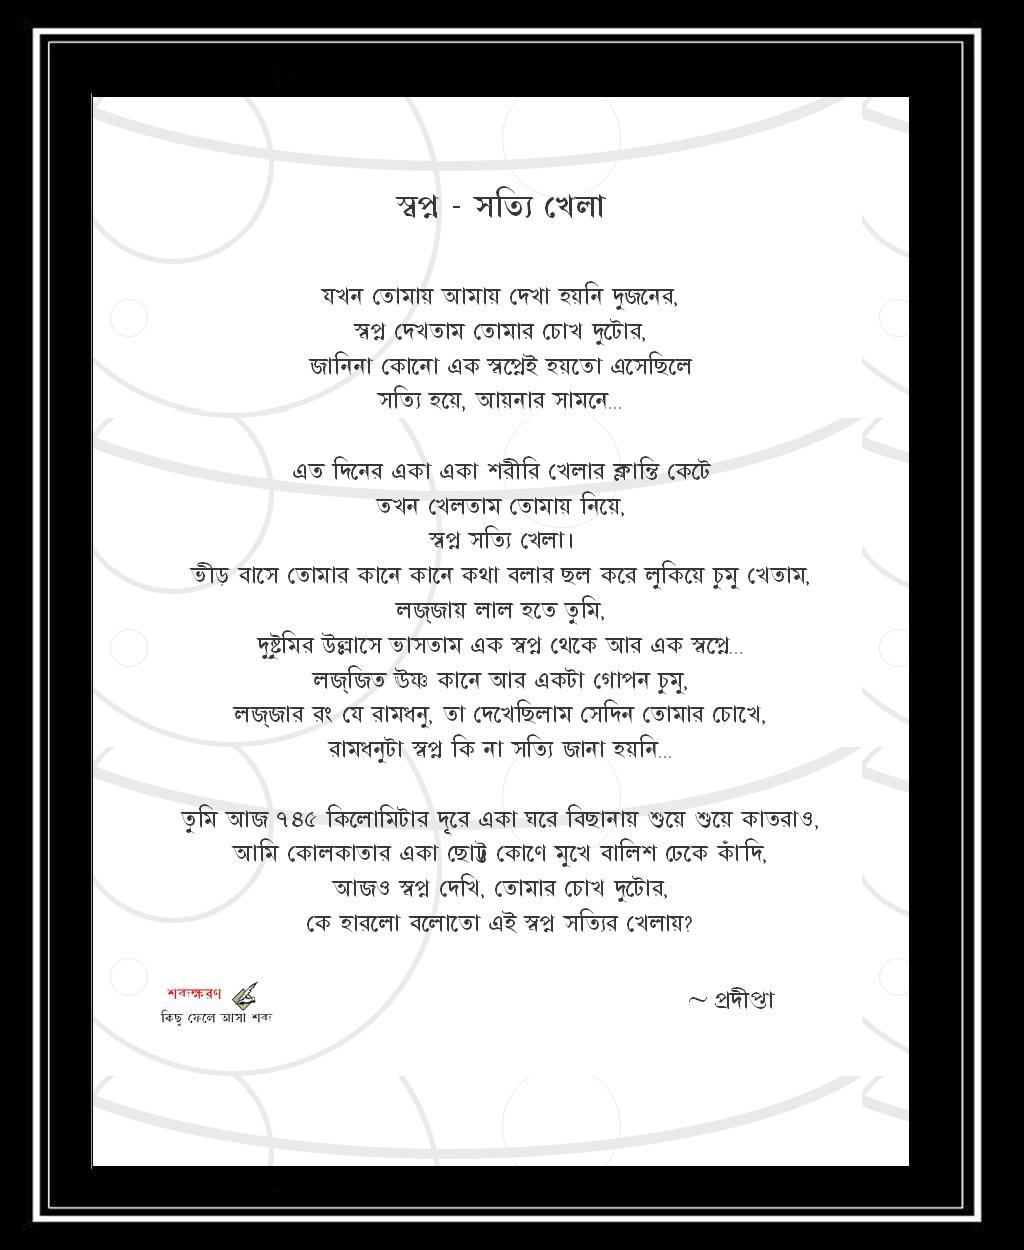 Bangla Golpo Kobita